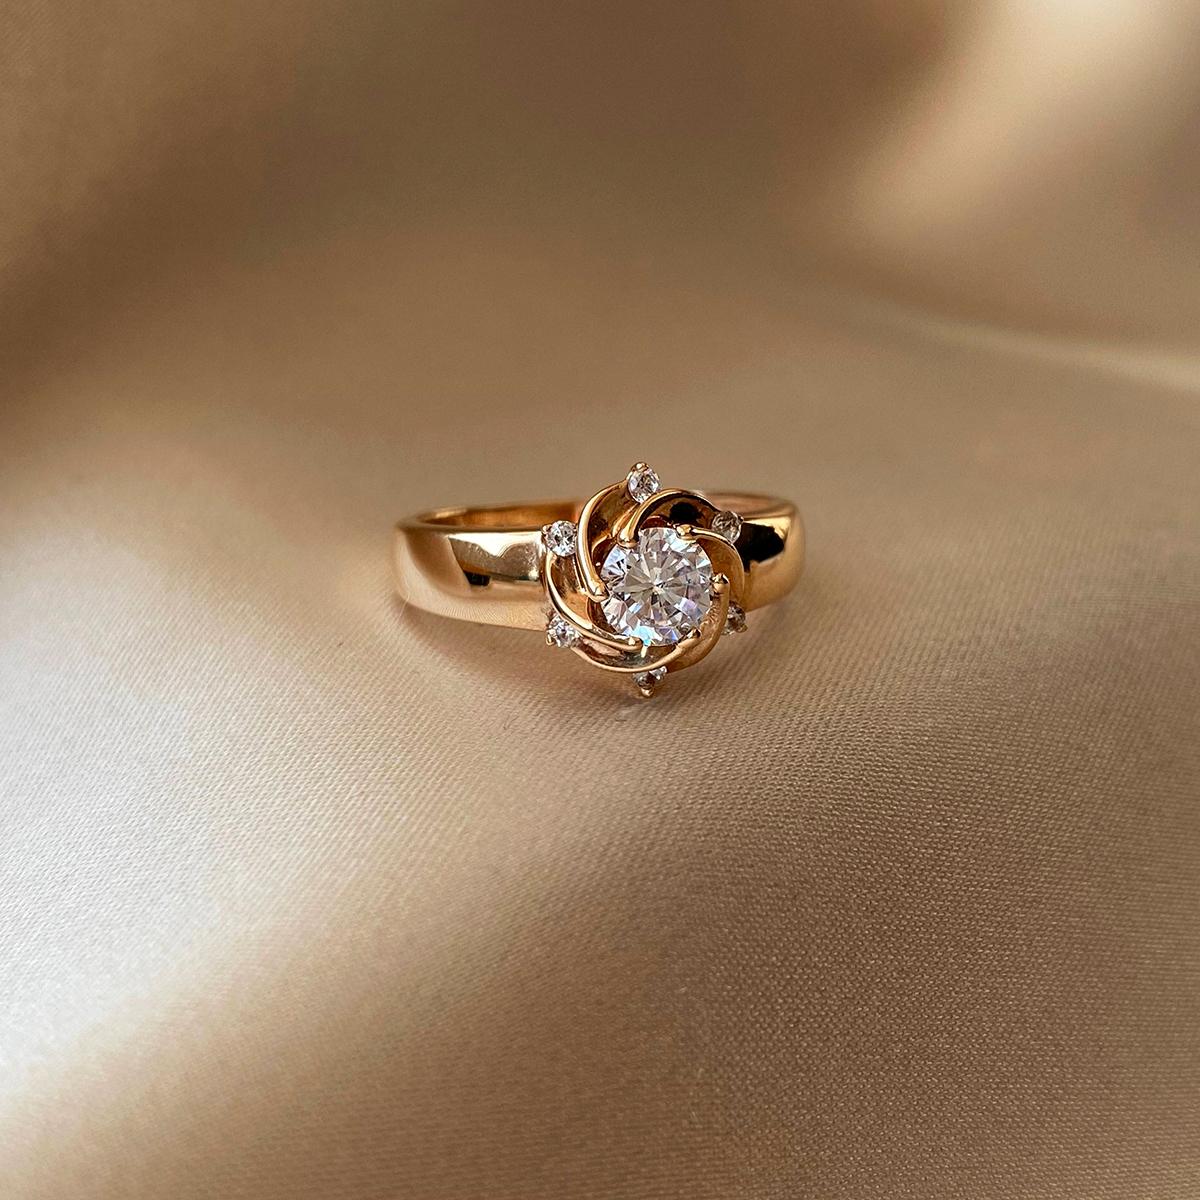 Кольцо из красного золота Вилена с фианитами 000103730 15.5 размера от Zlato - 4